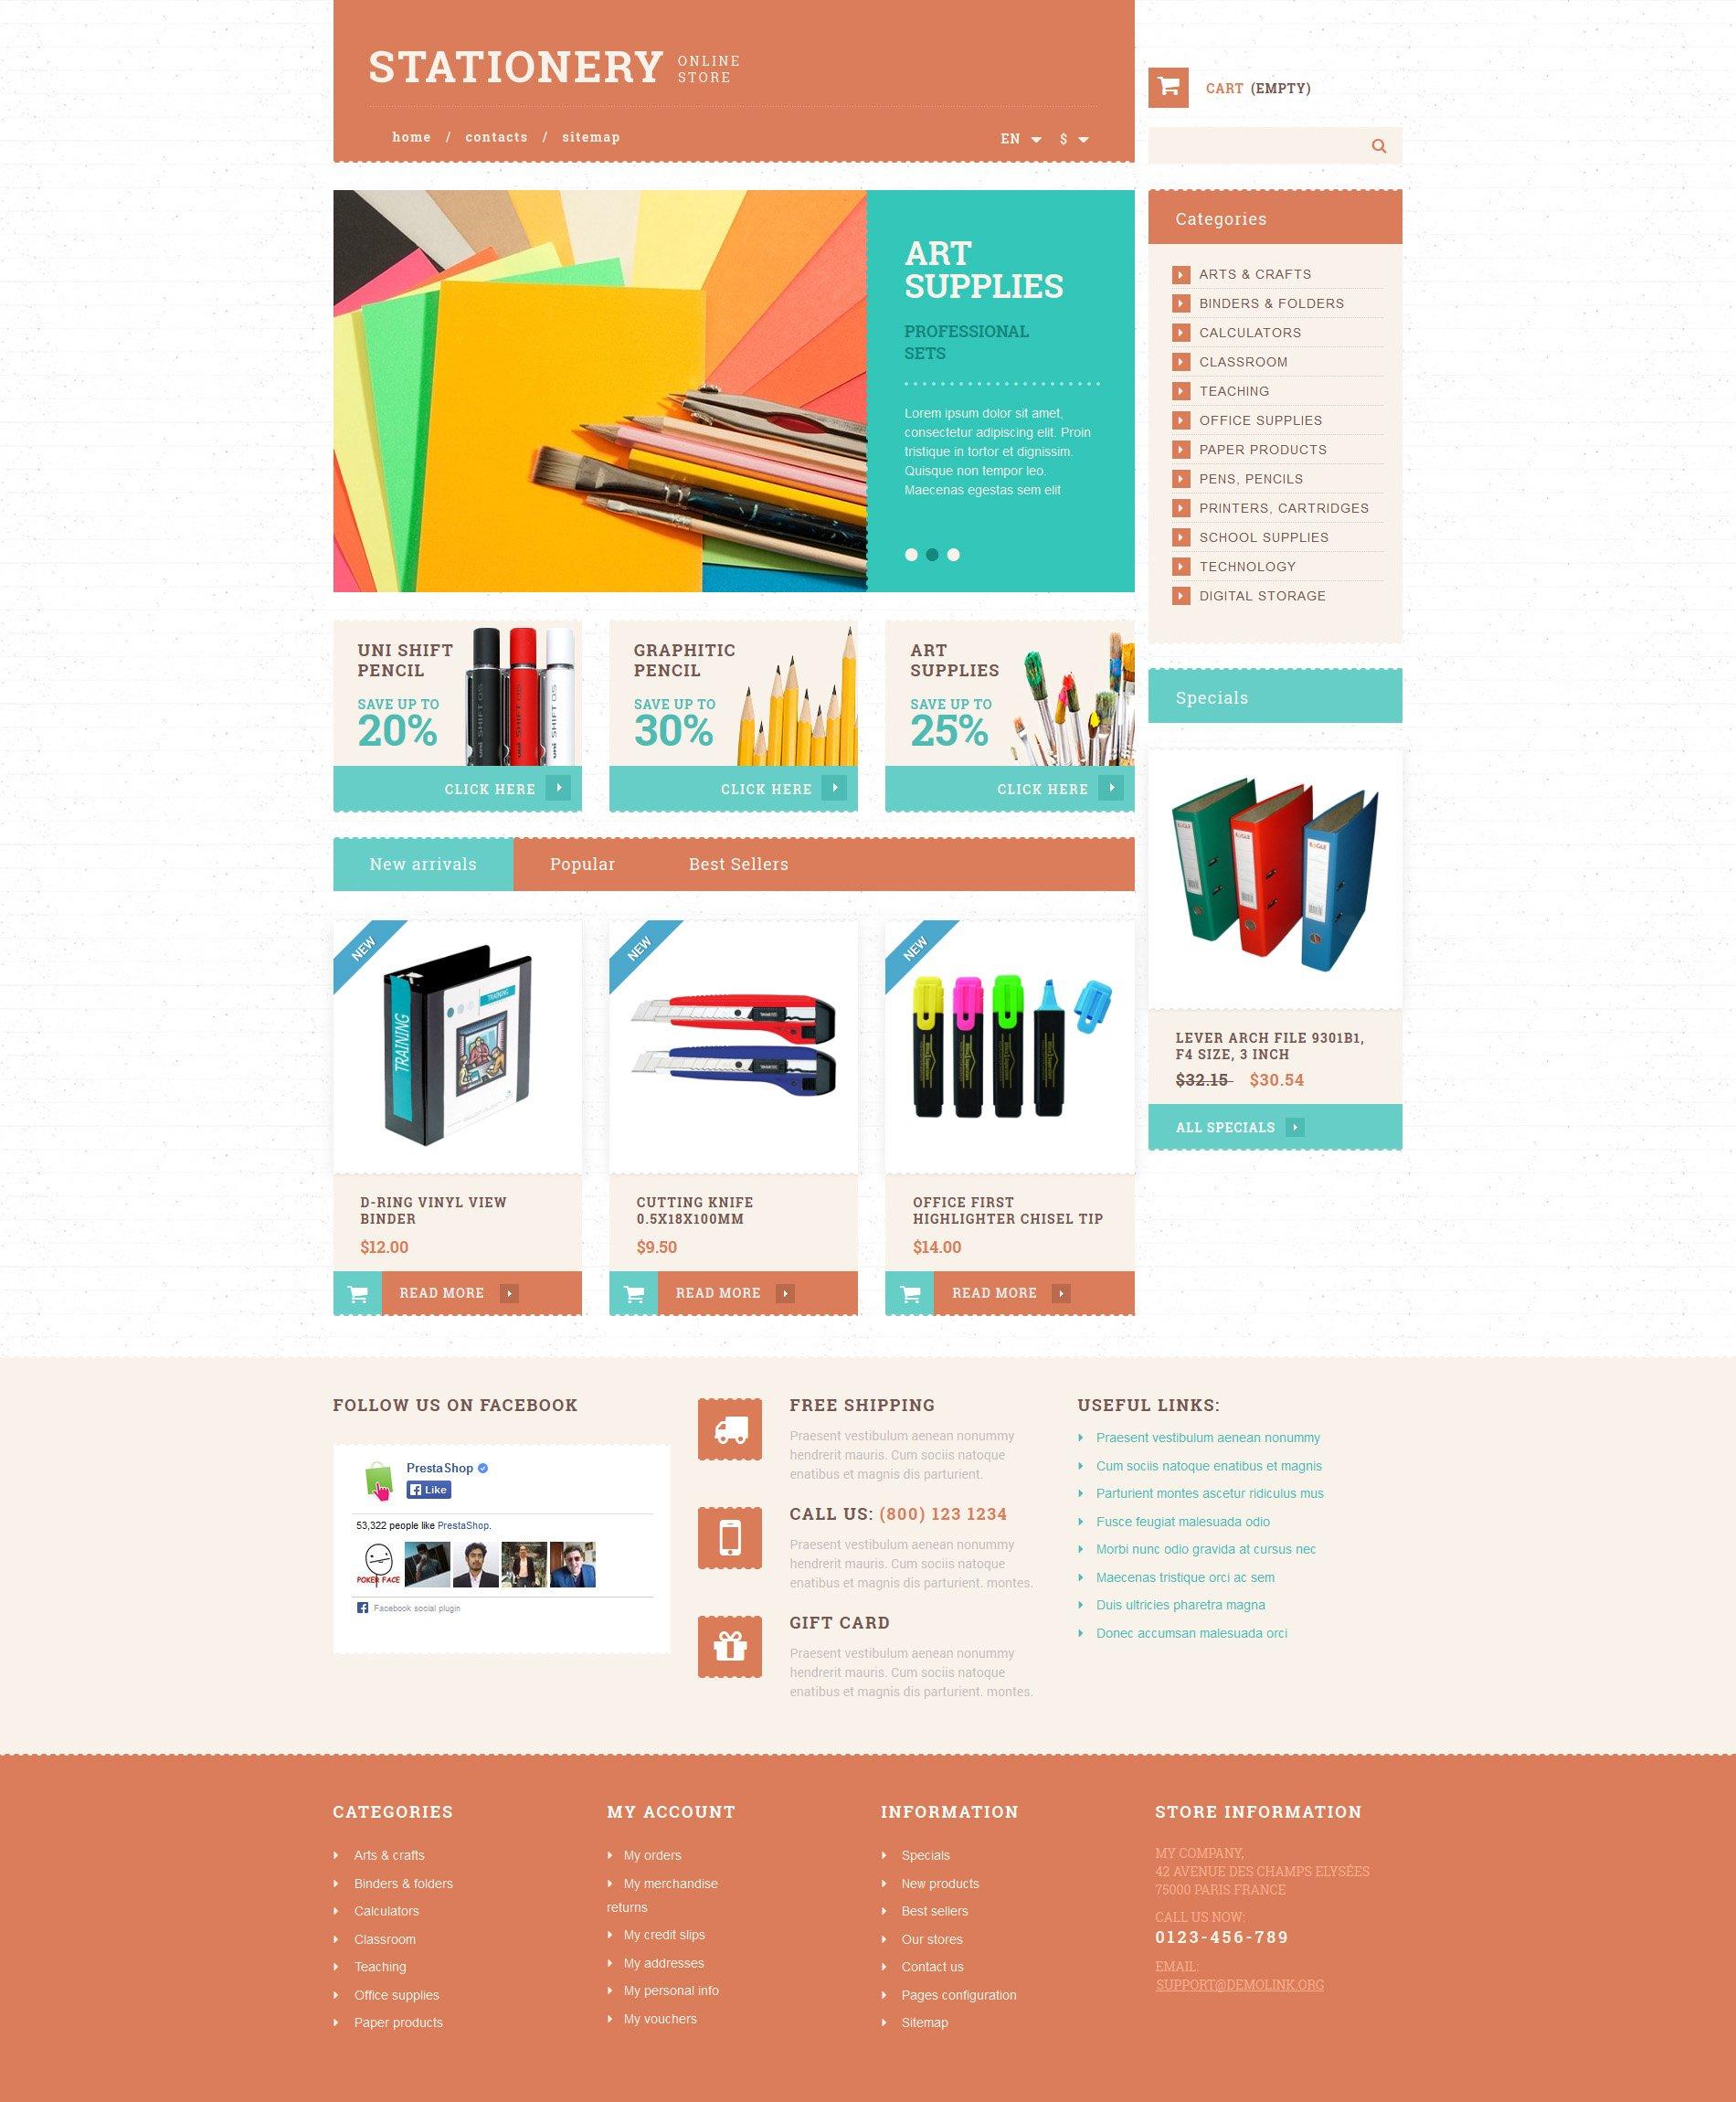 Stationery and Paper PrestaShop Theme - screenshot